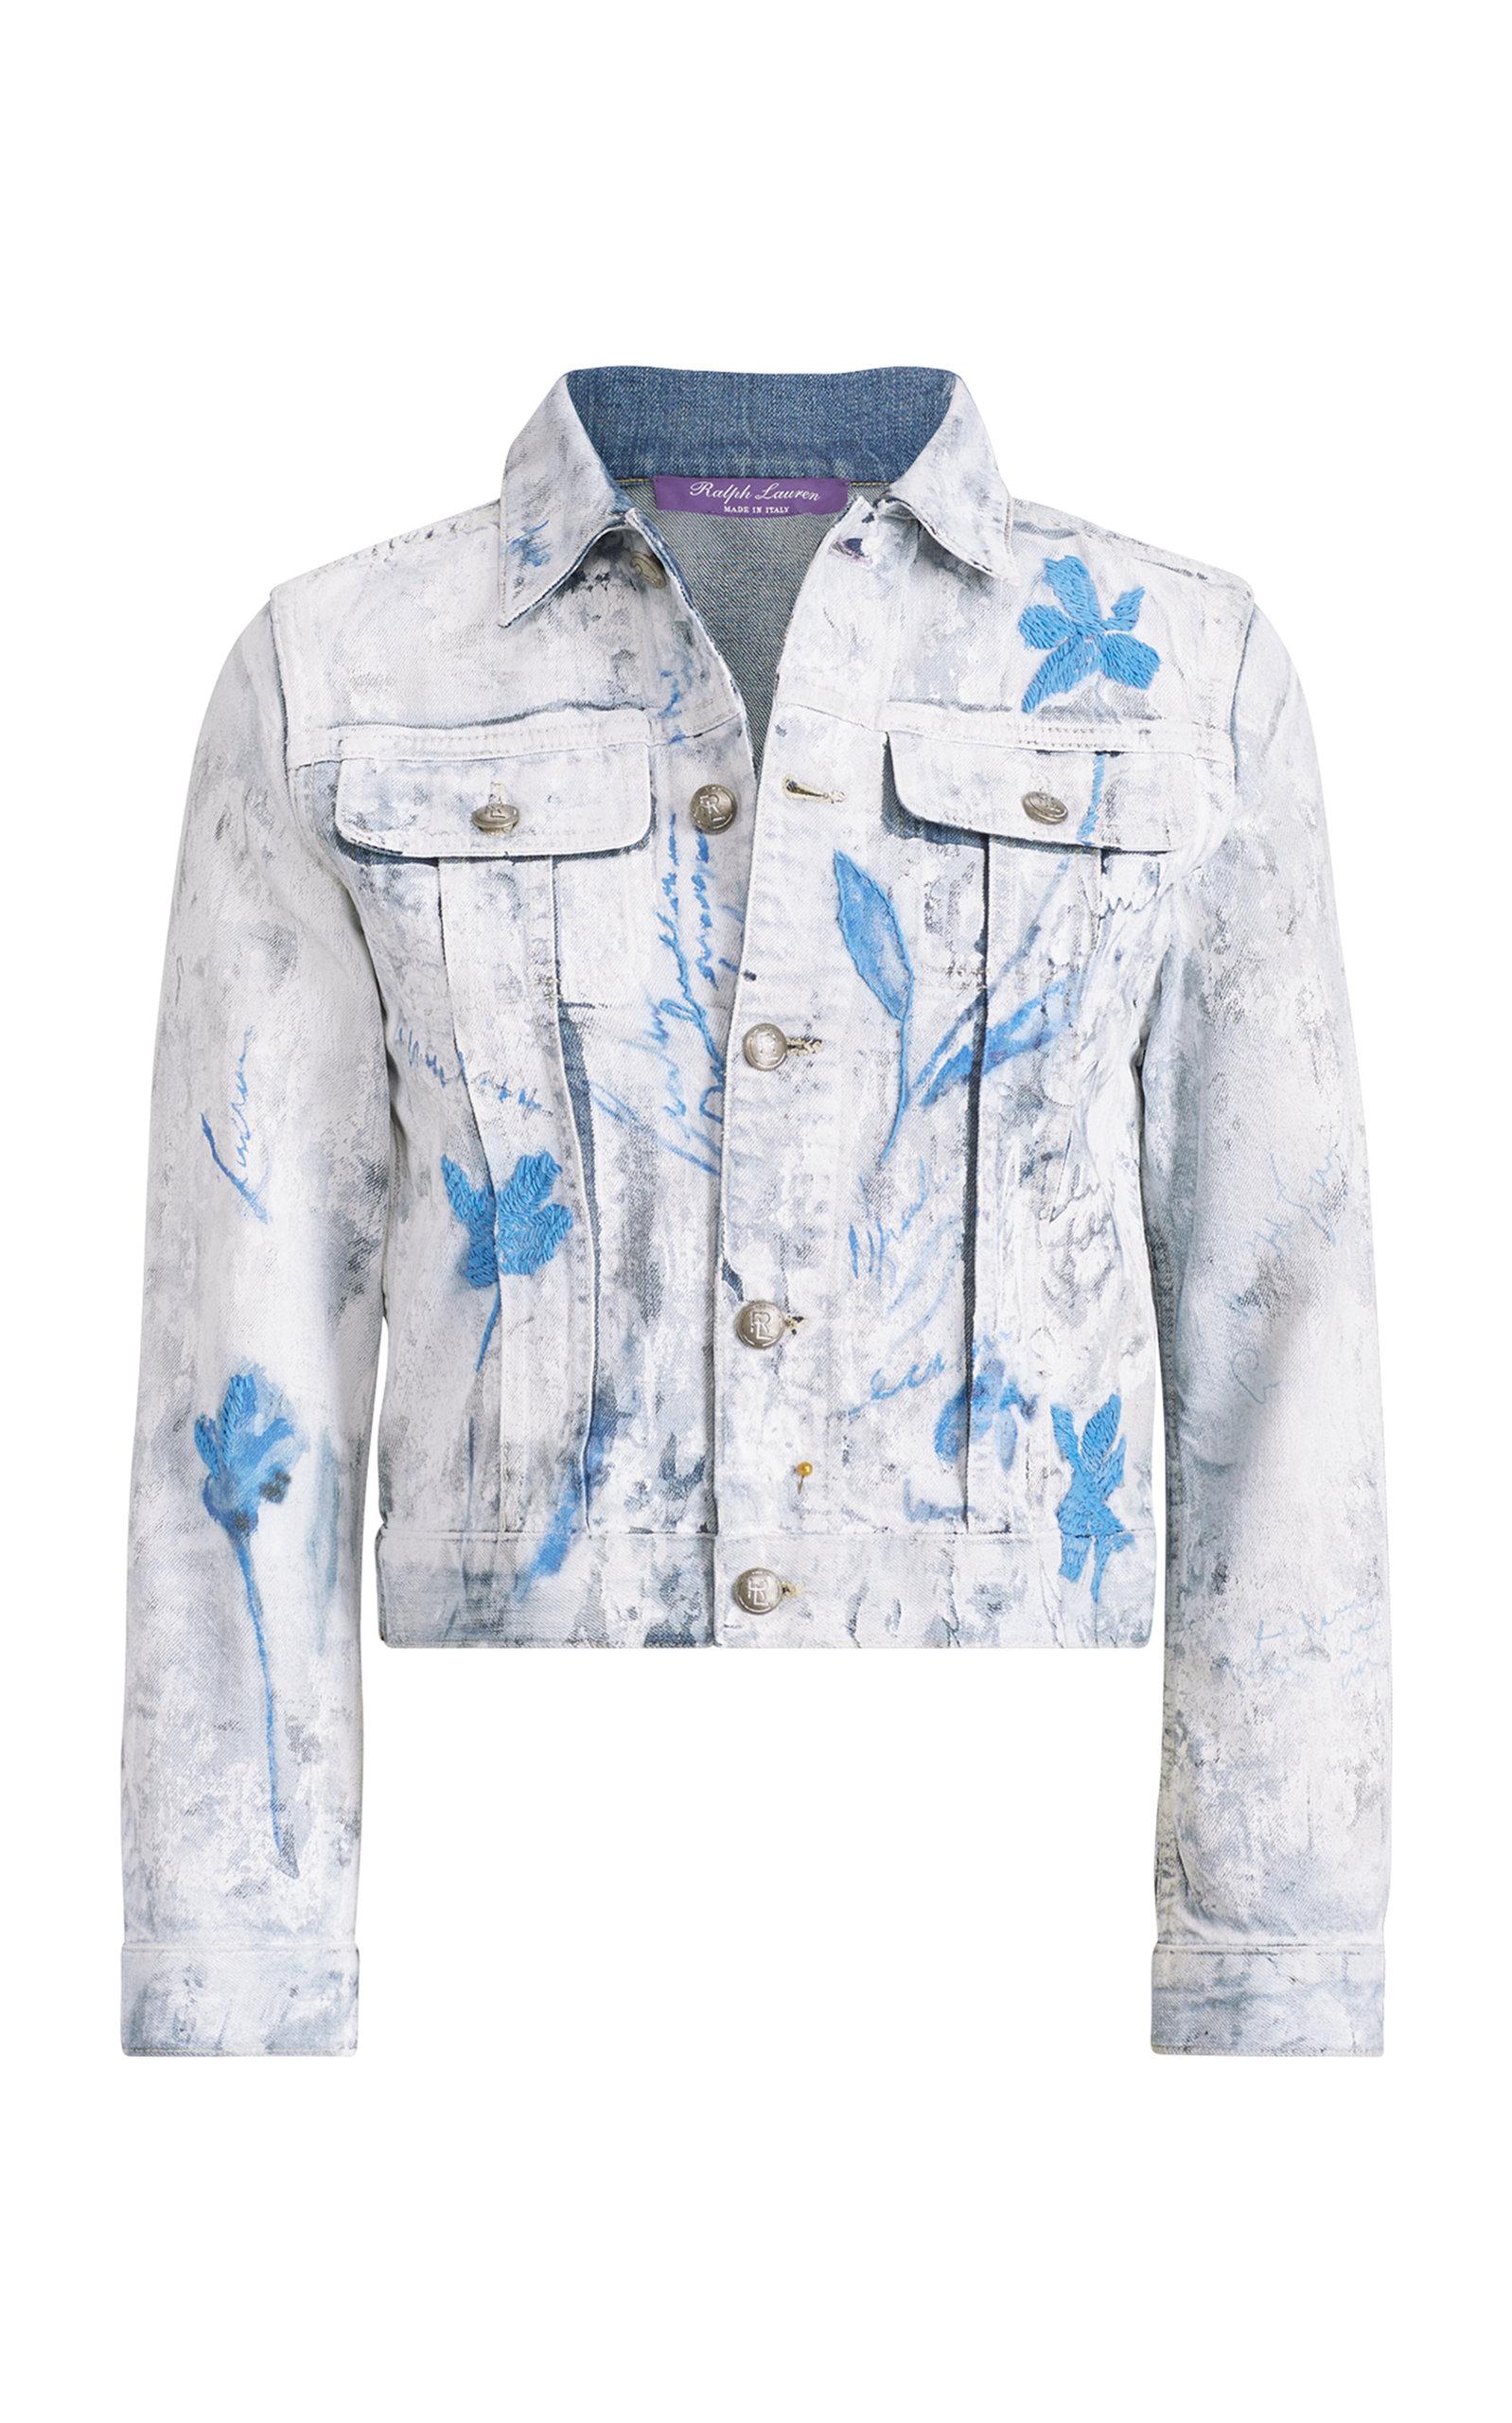 Ralph Lauren Jackets Cropped Trucker Painted Jacket